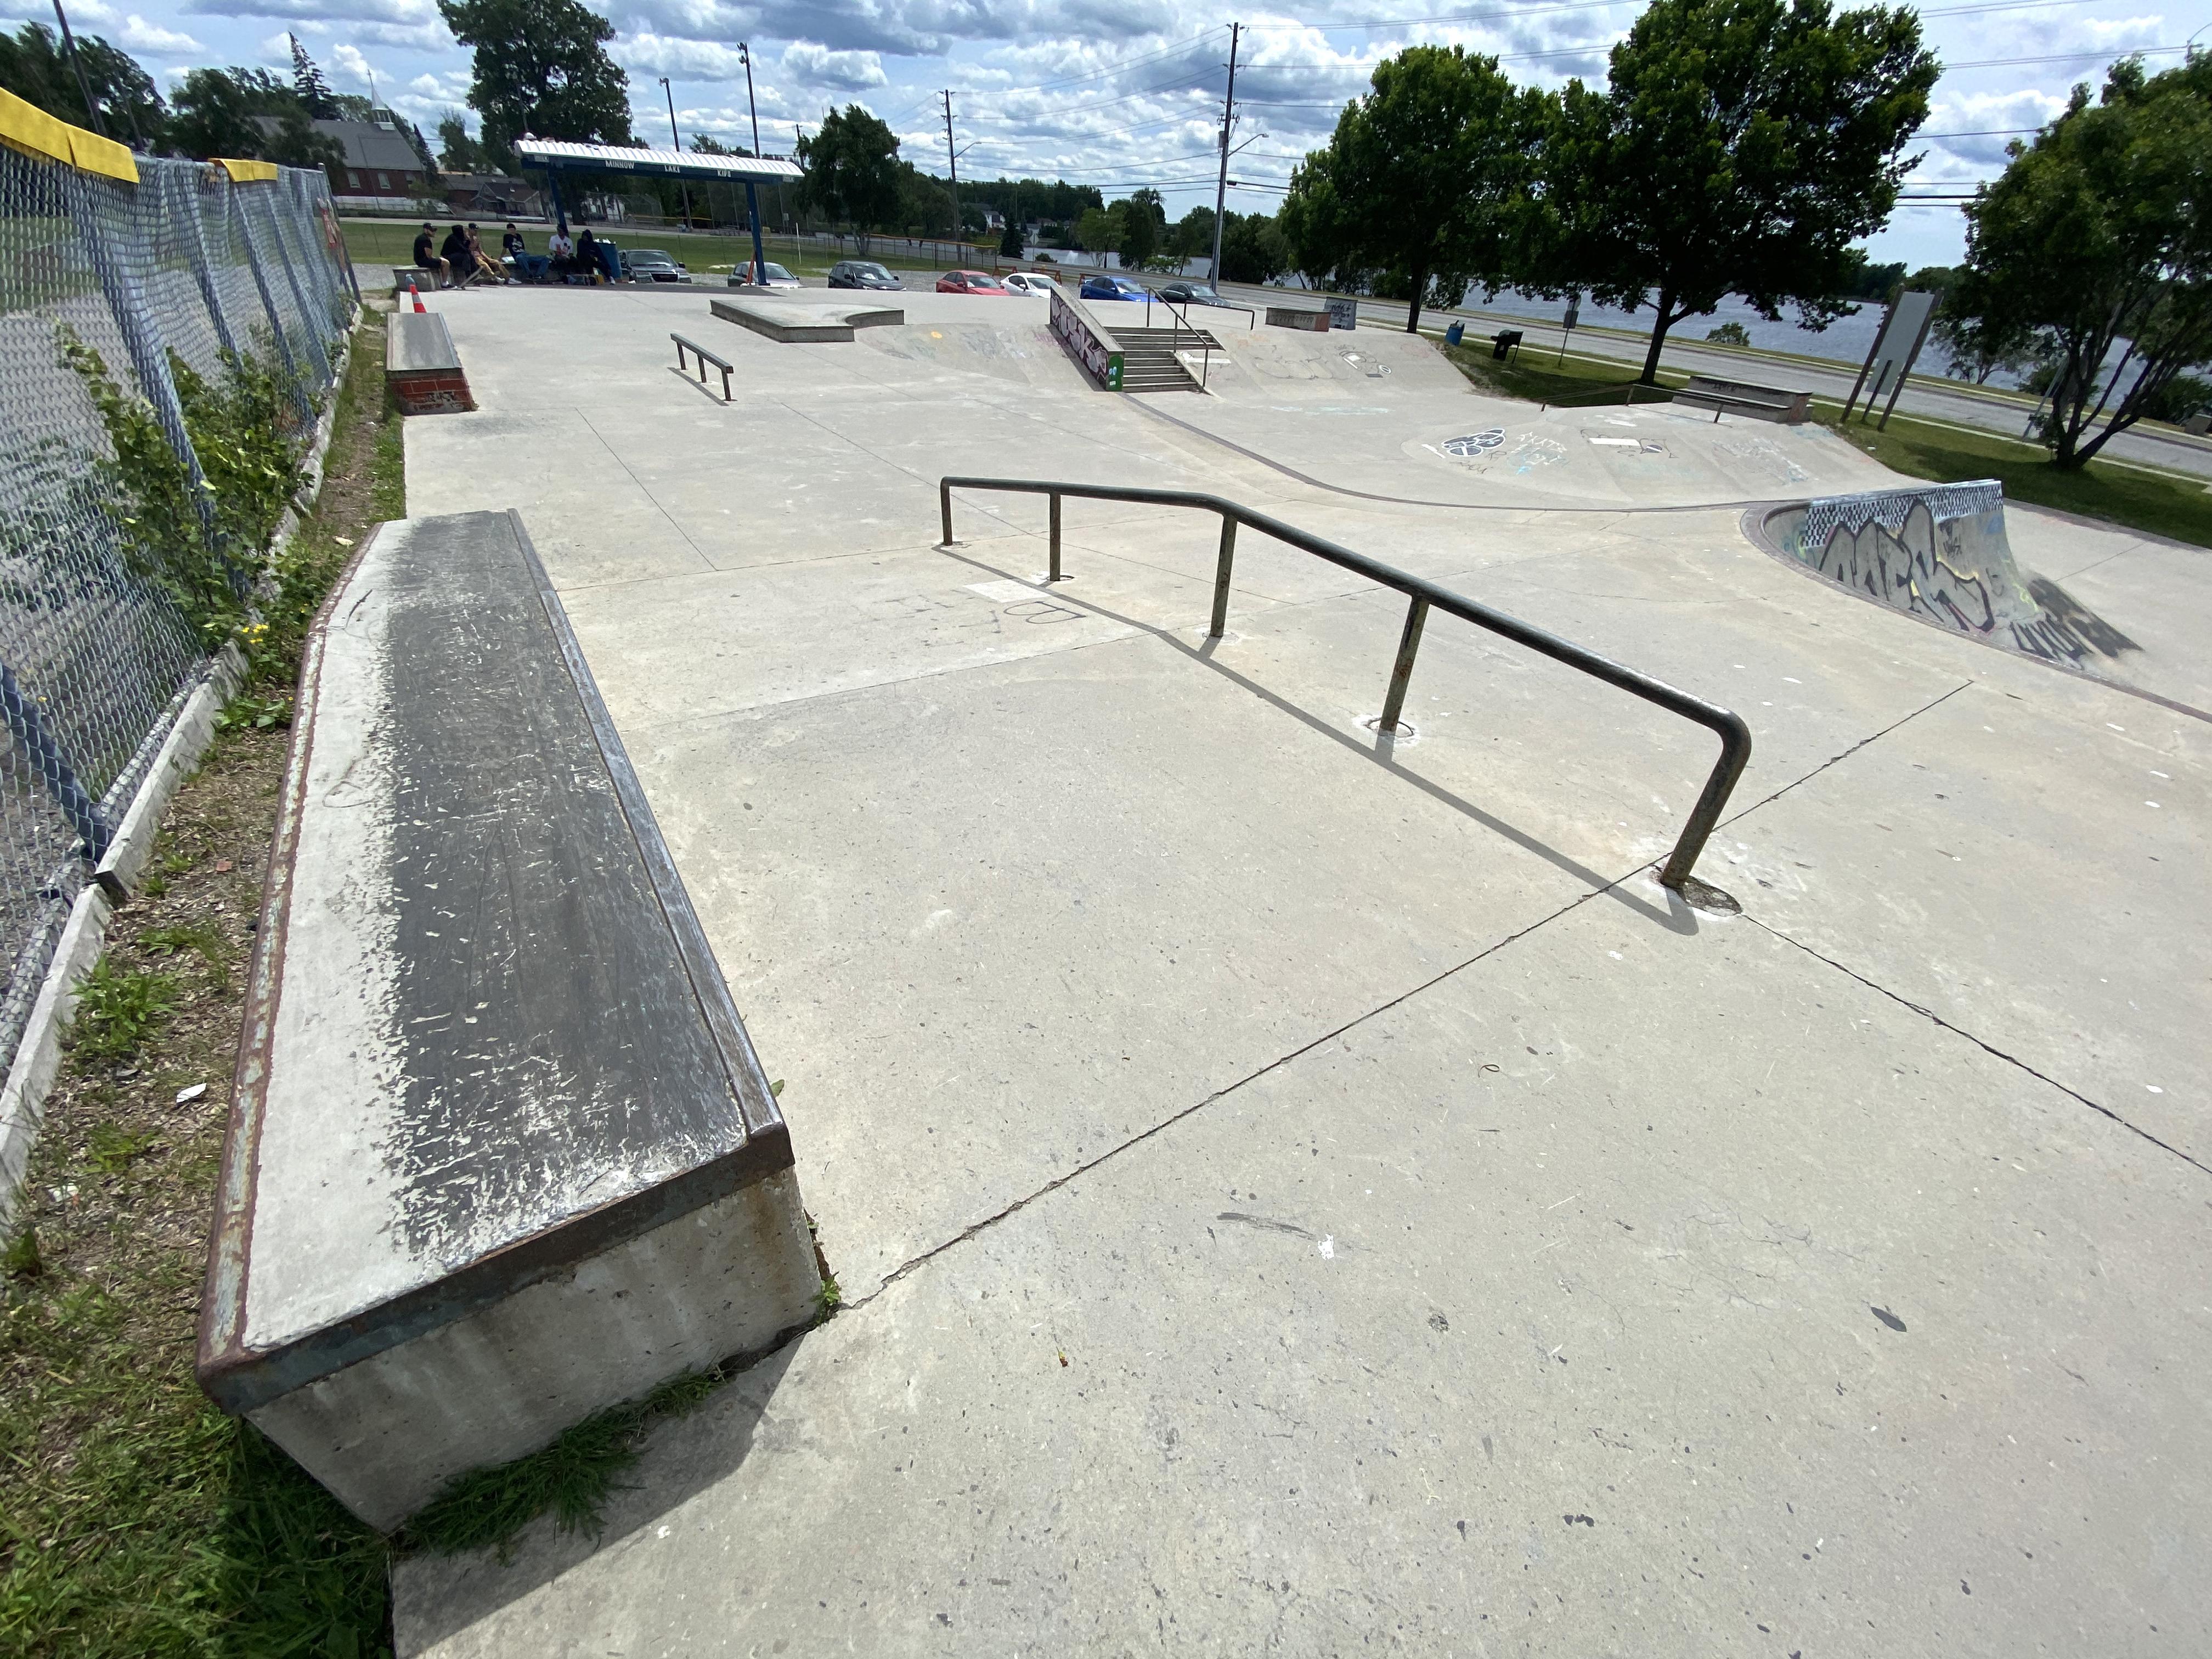 Sudbury Skatepark across and down rail and ledge